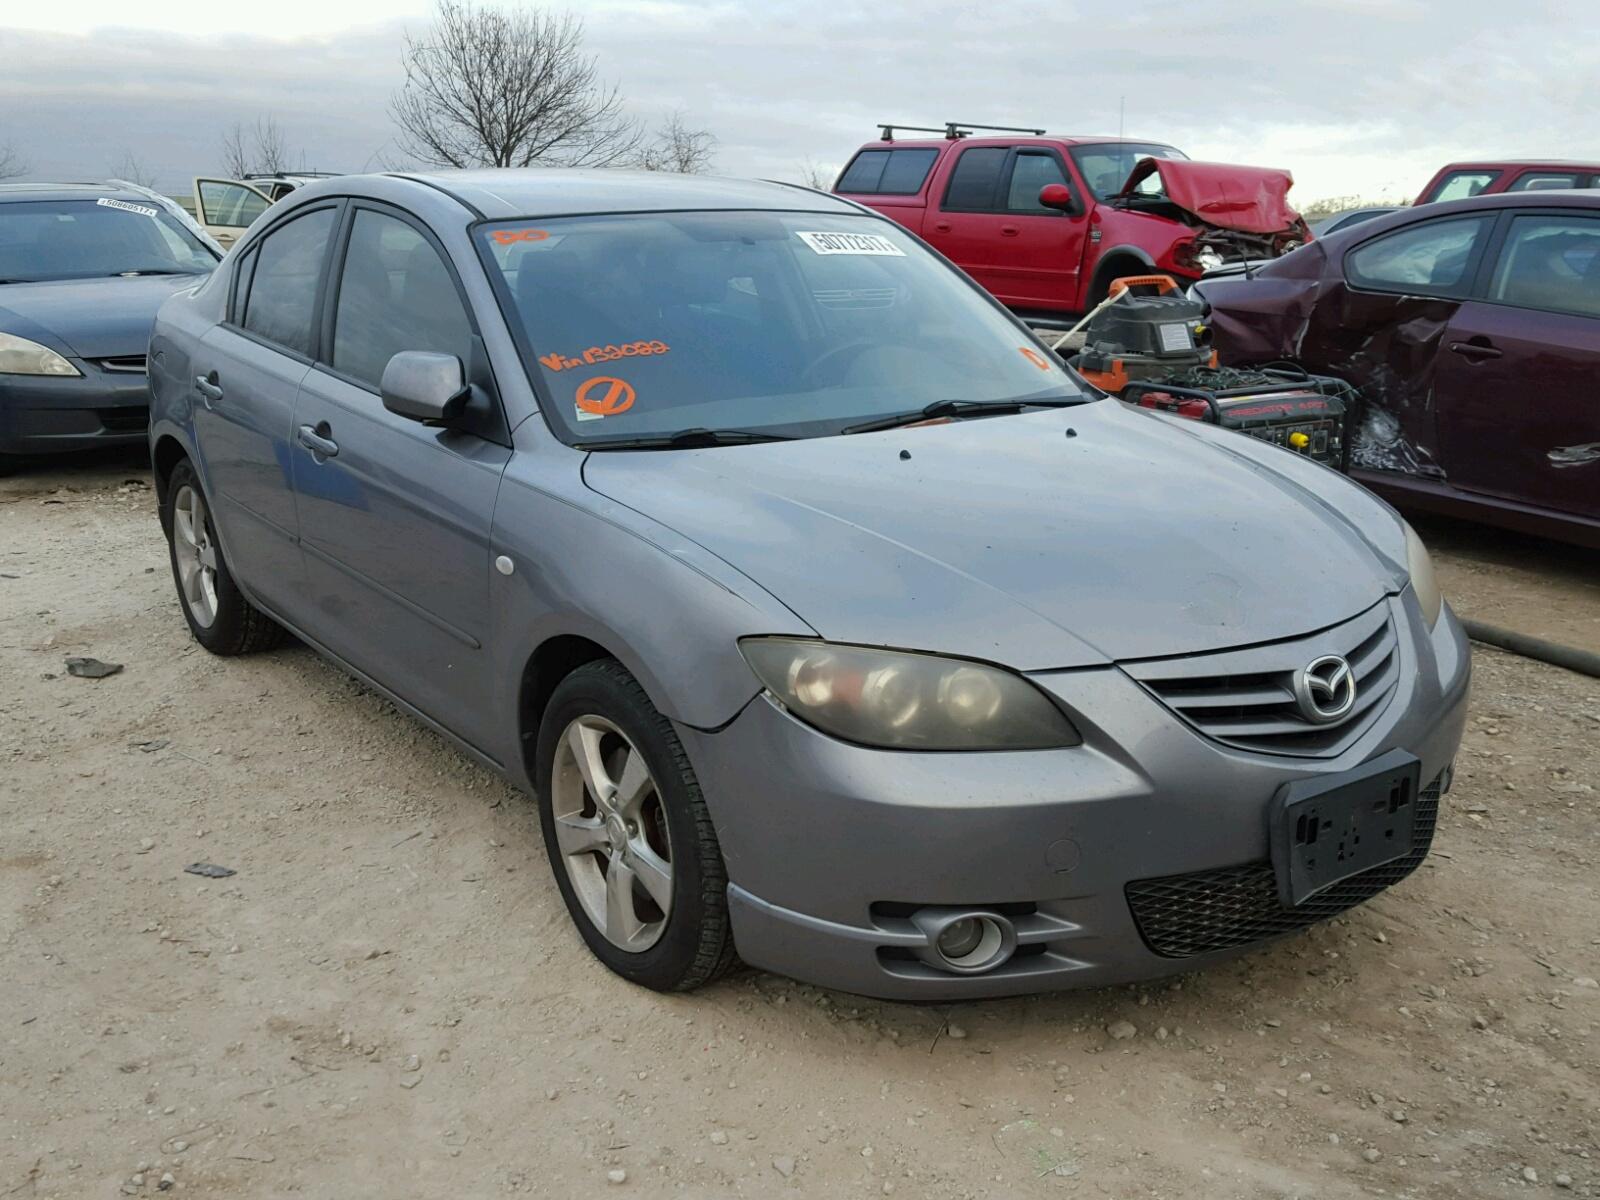 kansas s sale city tribute lot mazda for cars ks copart at